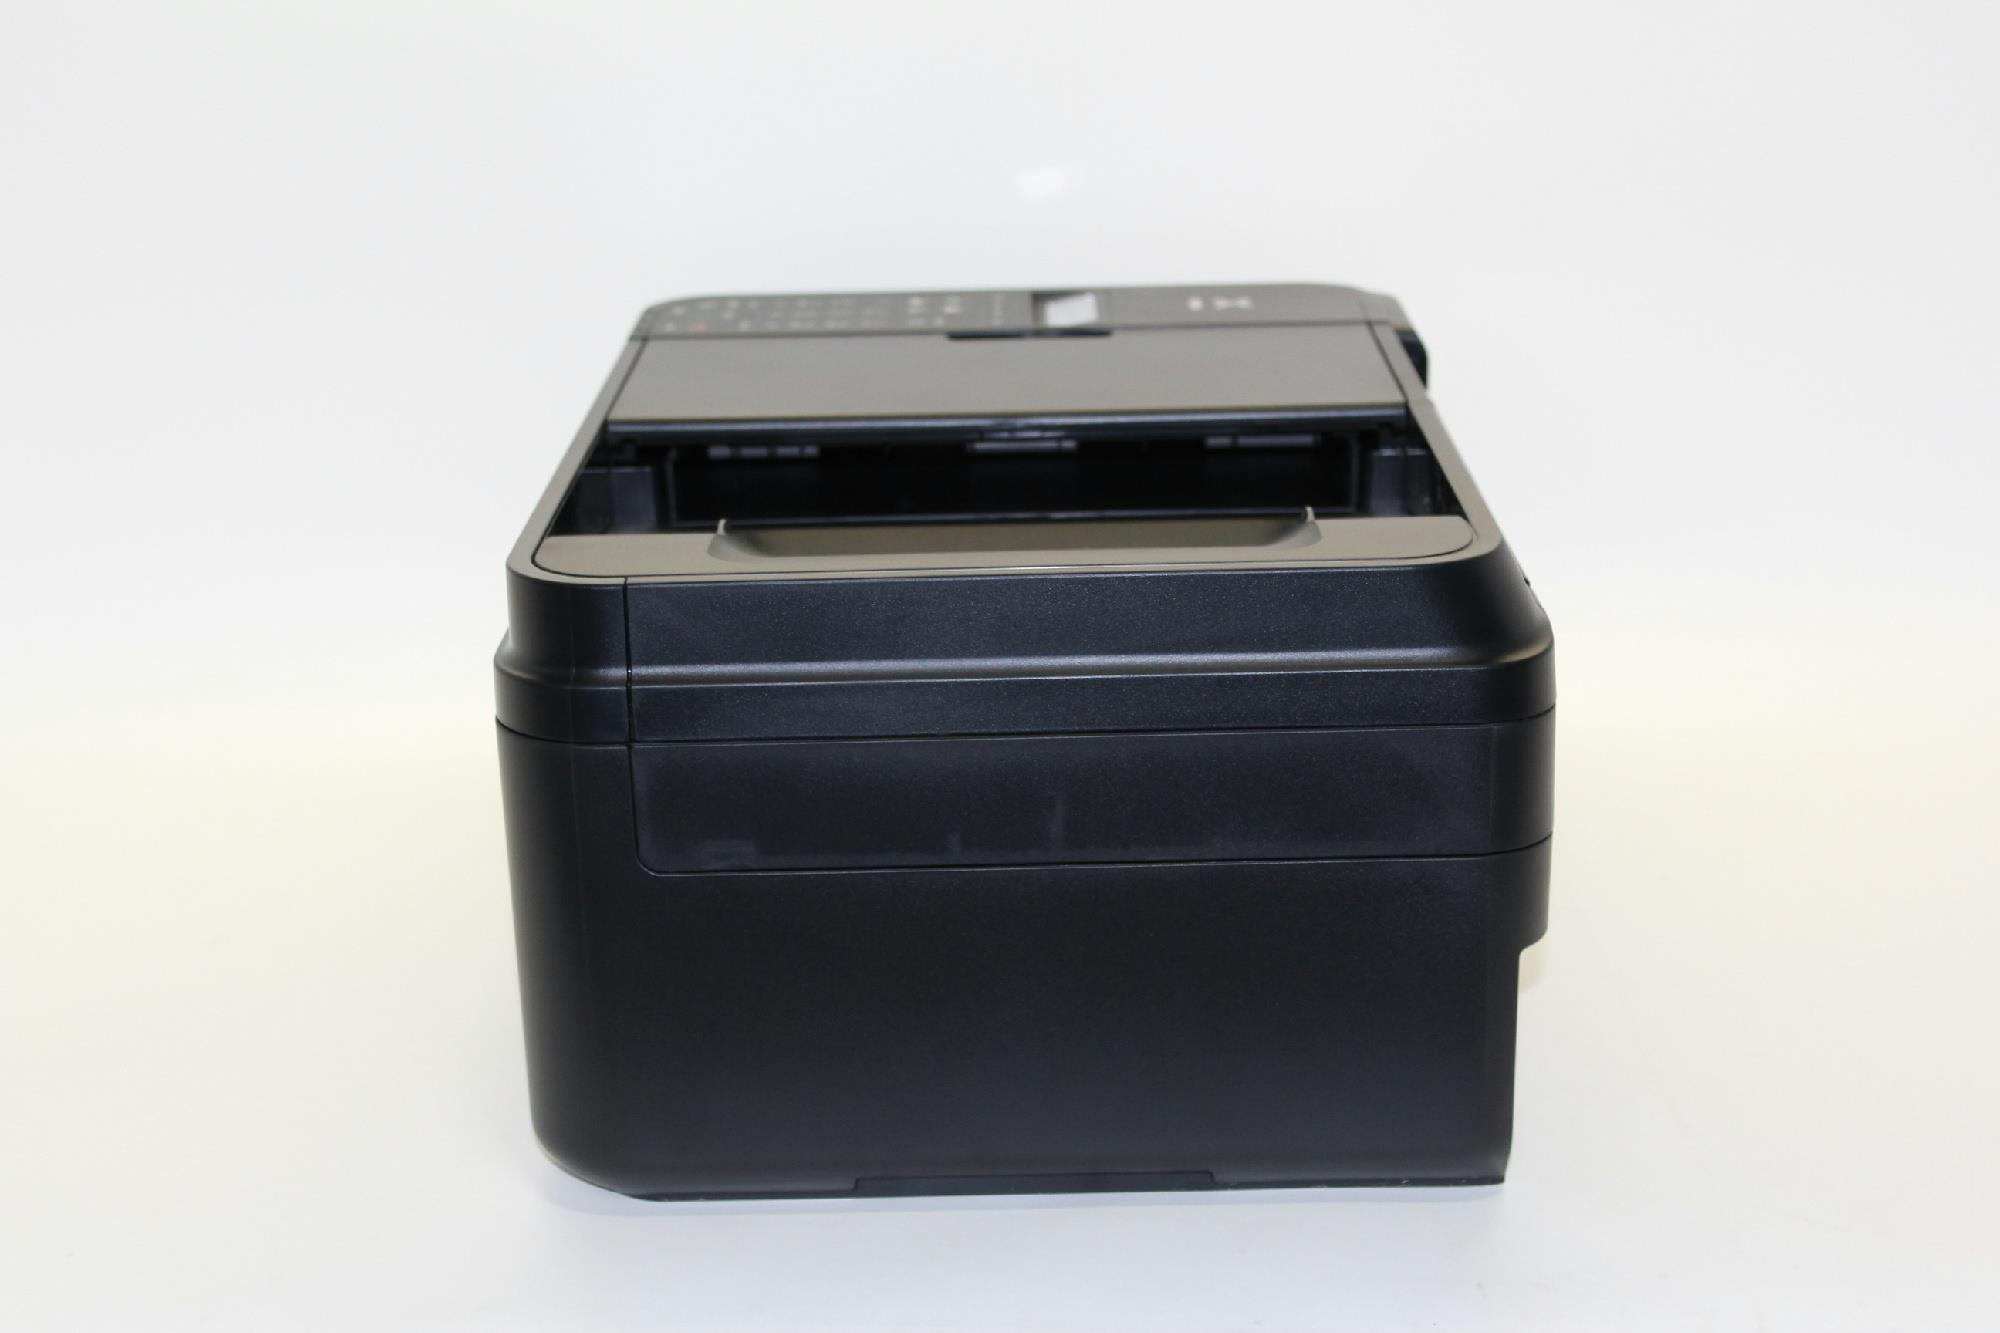 canon pixma all in one inkjet wireless office machine